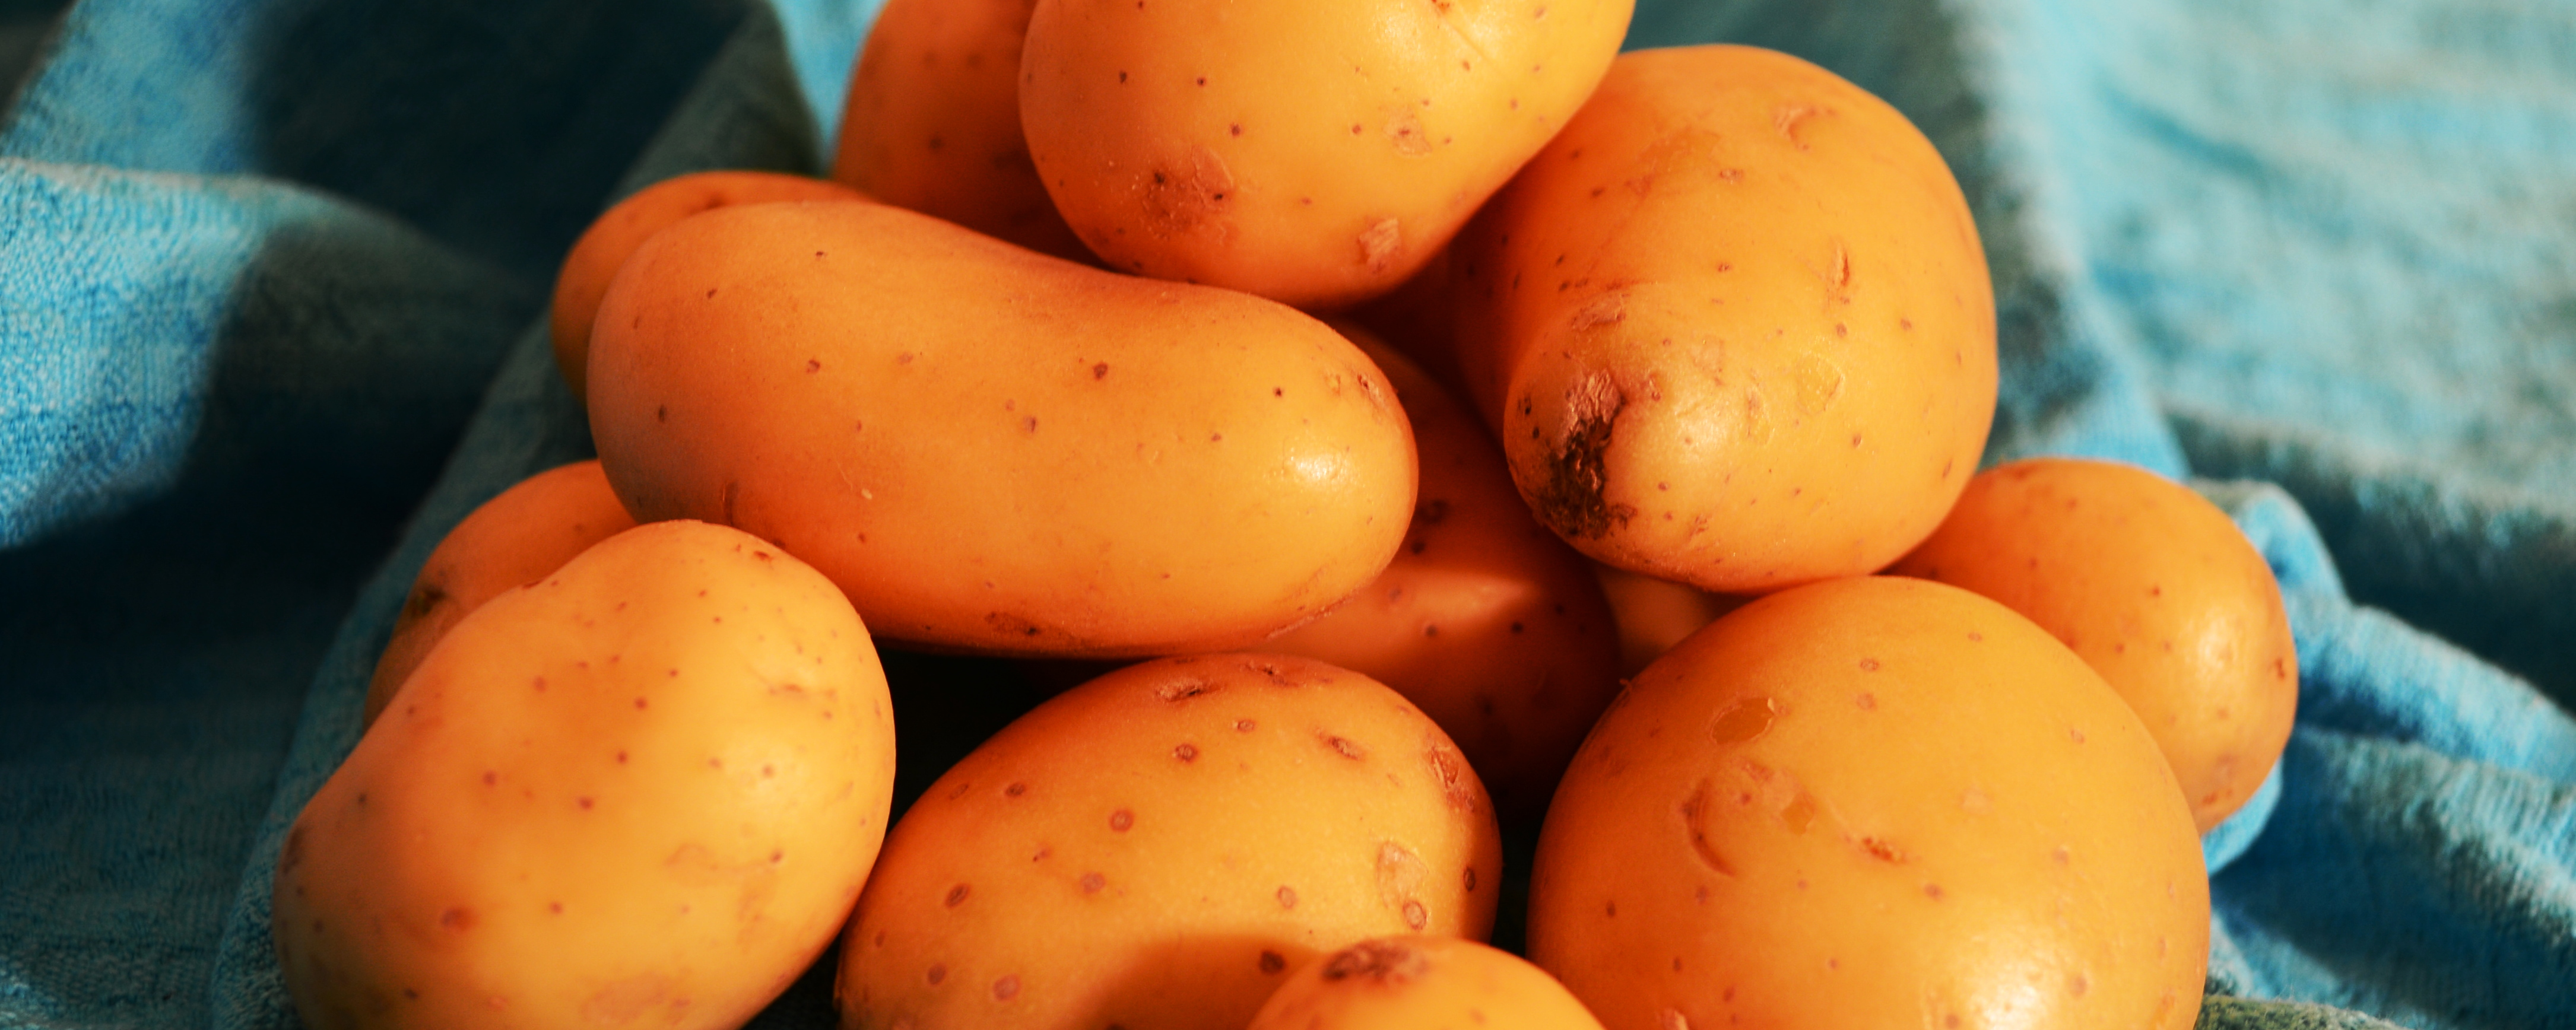 Der Klassiker unter den gemüsigen Kohlenhydraten: die Kartoffel.